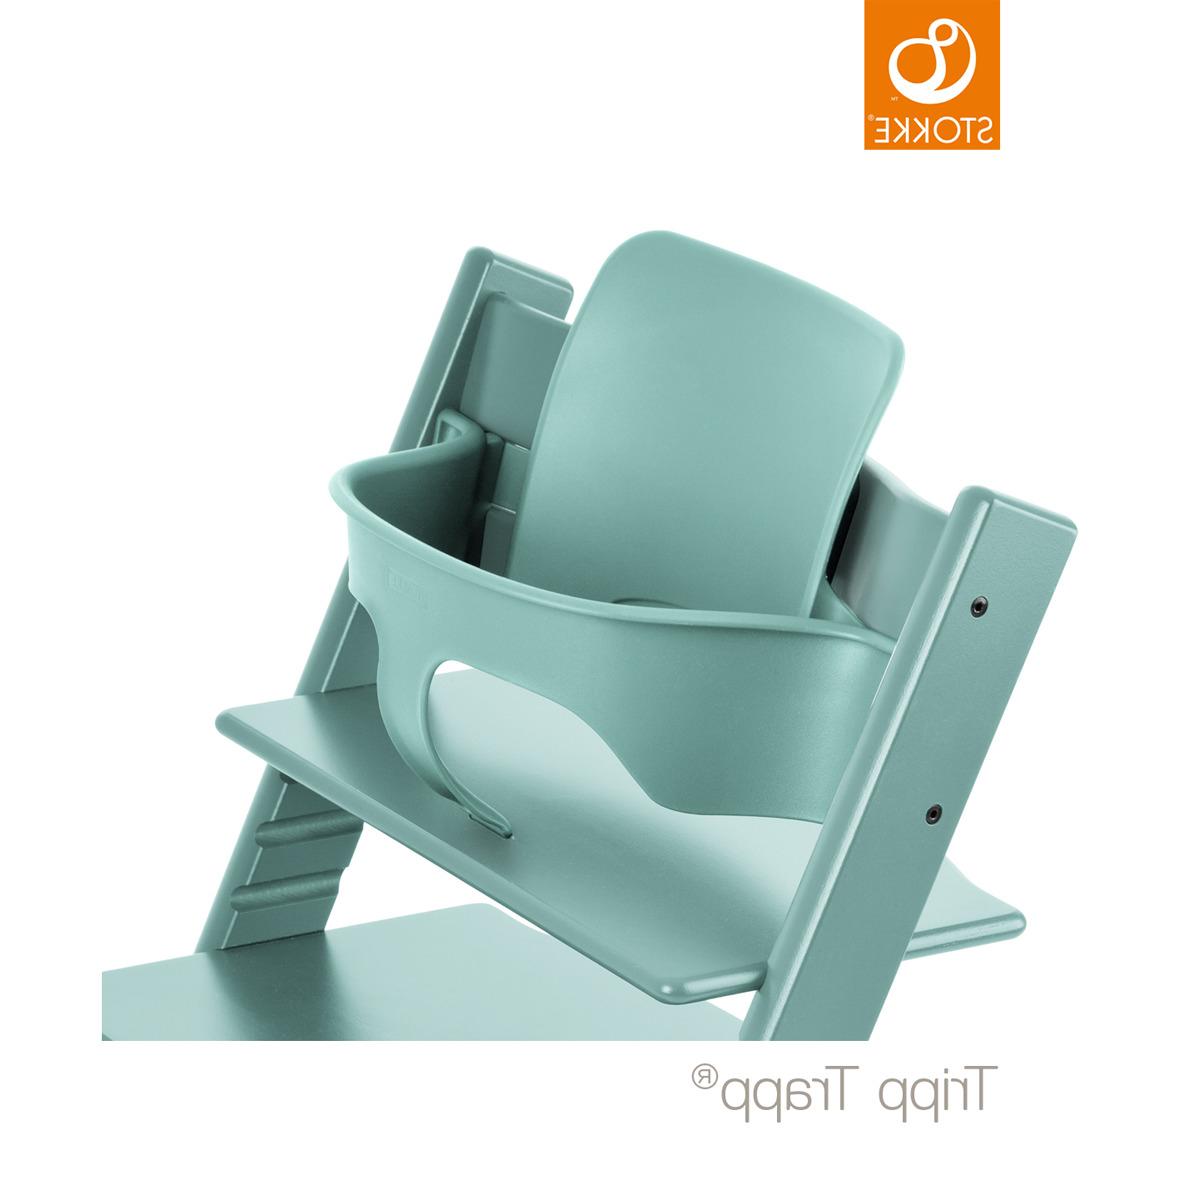 Sillas Stokke H9d9 Baby Set Para Silla Tripp Trapp Bebe Urbano